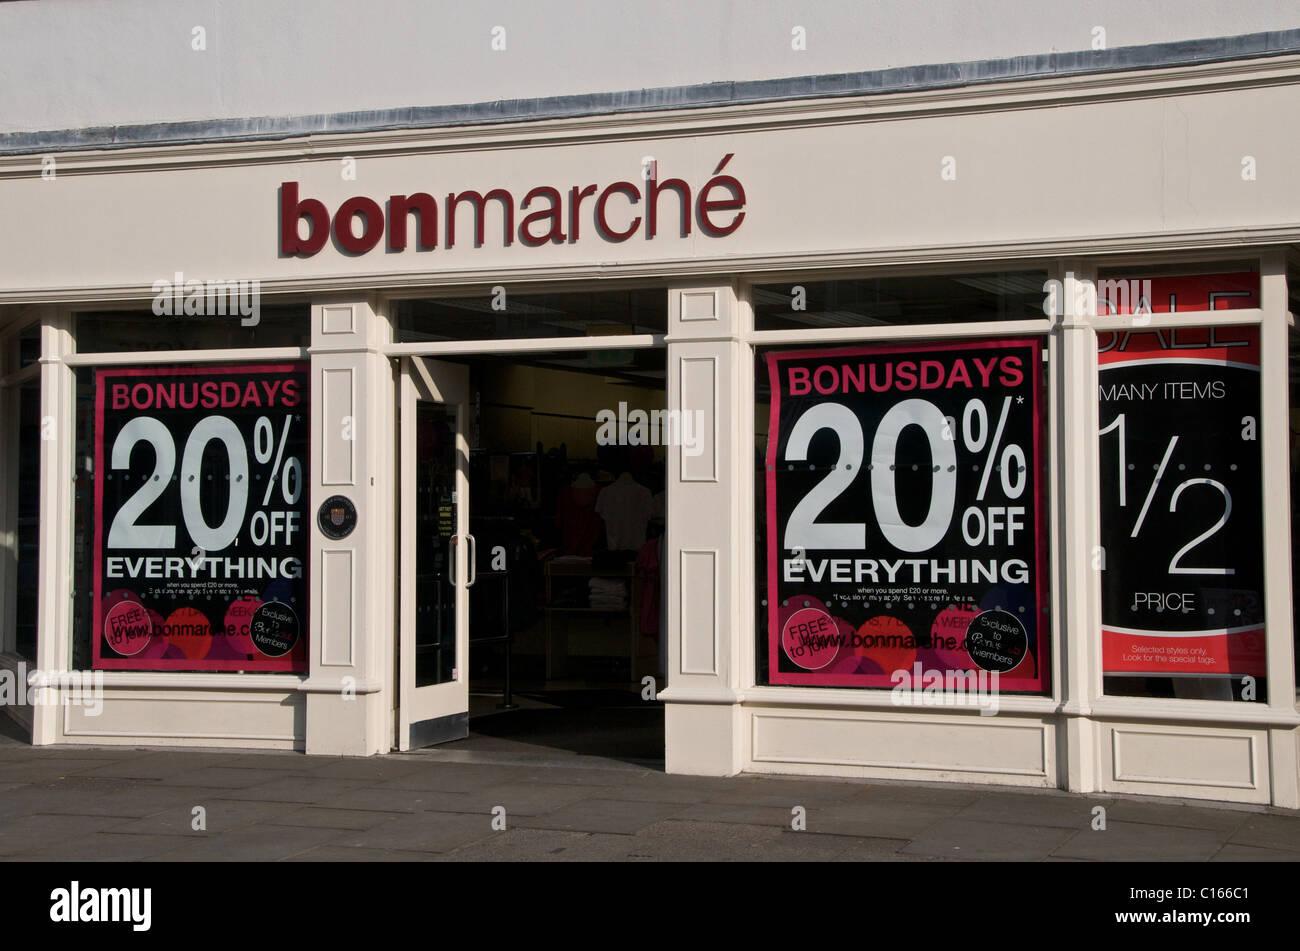 Bon Marche logo name - Stock Image